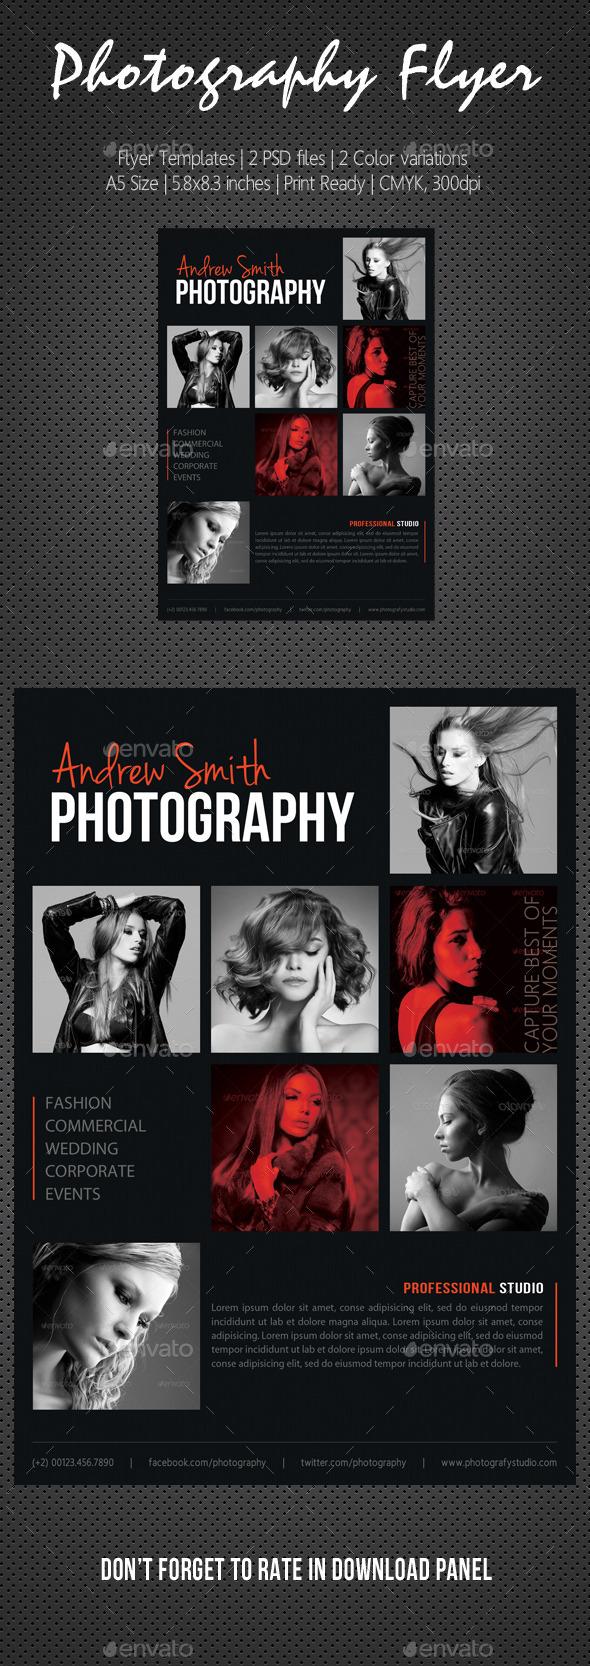 GraphicRiver Photography Studio Flyer 15 10796951